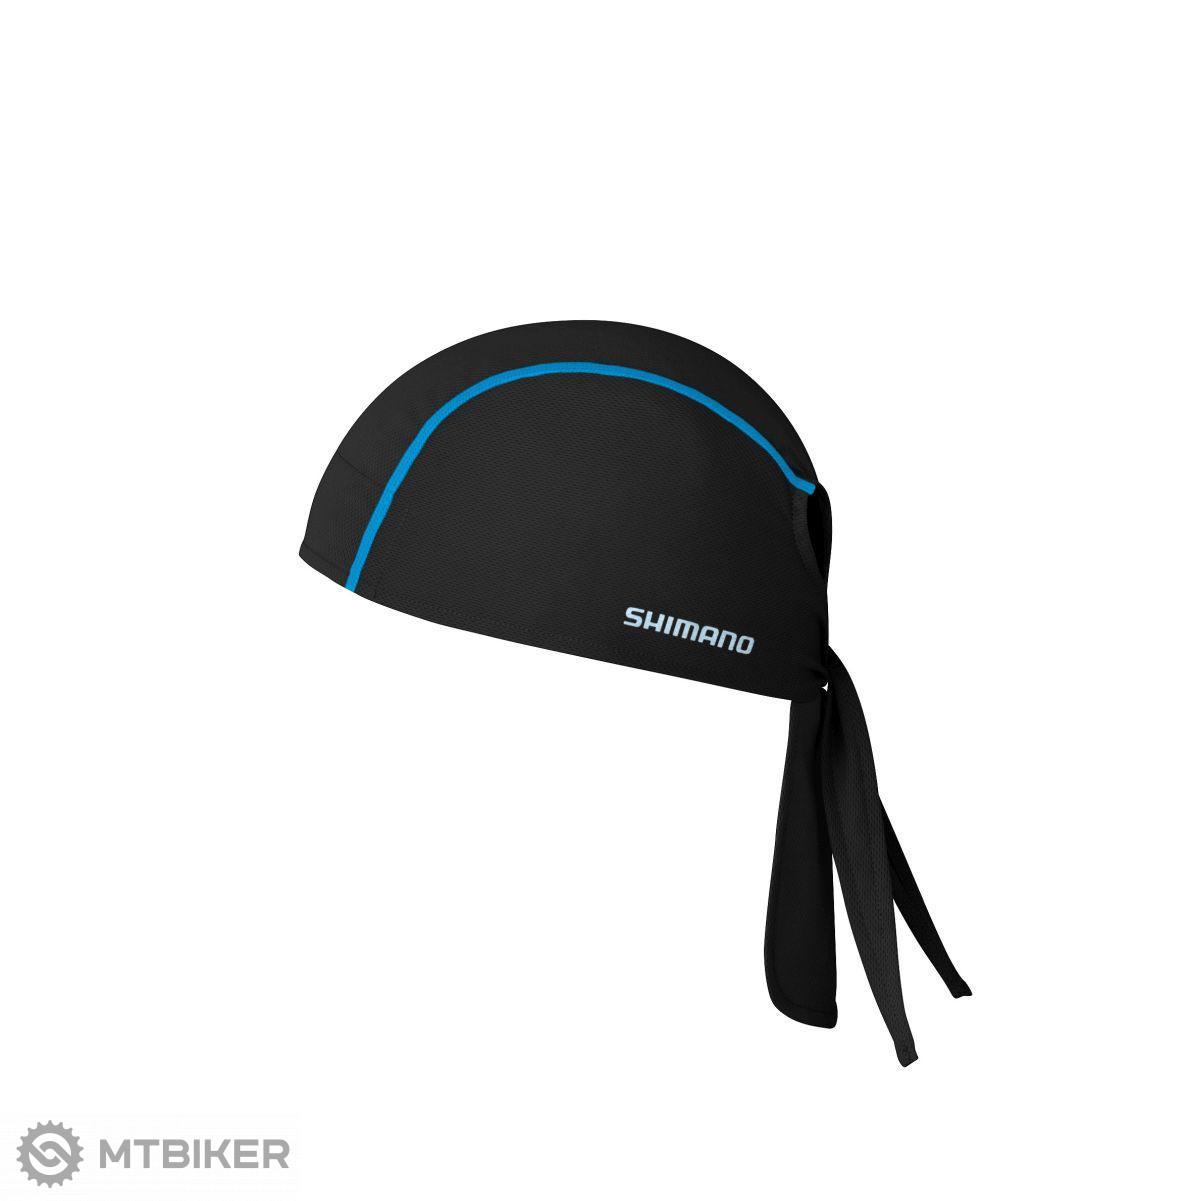 886e4187f Shimano Šatka Shimano Bandana čierna - MTBIKER Shop